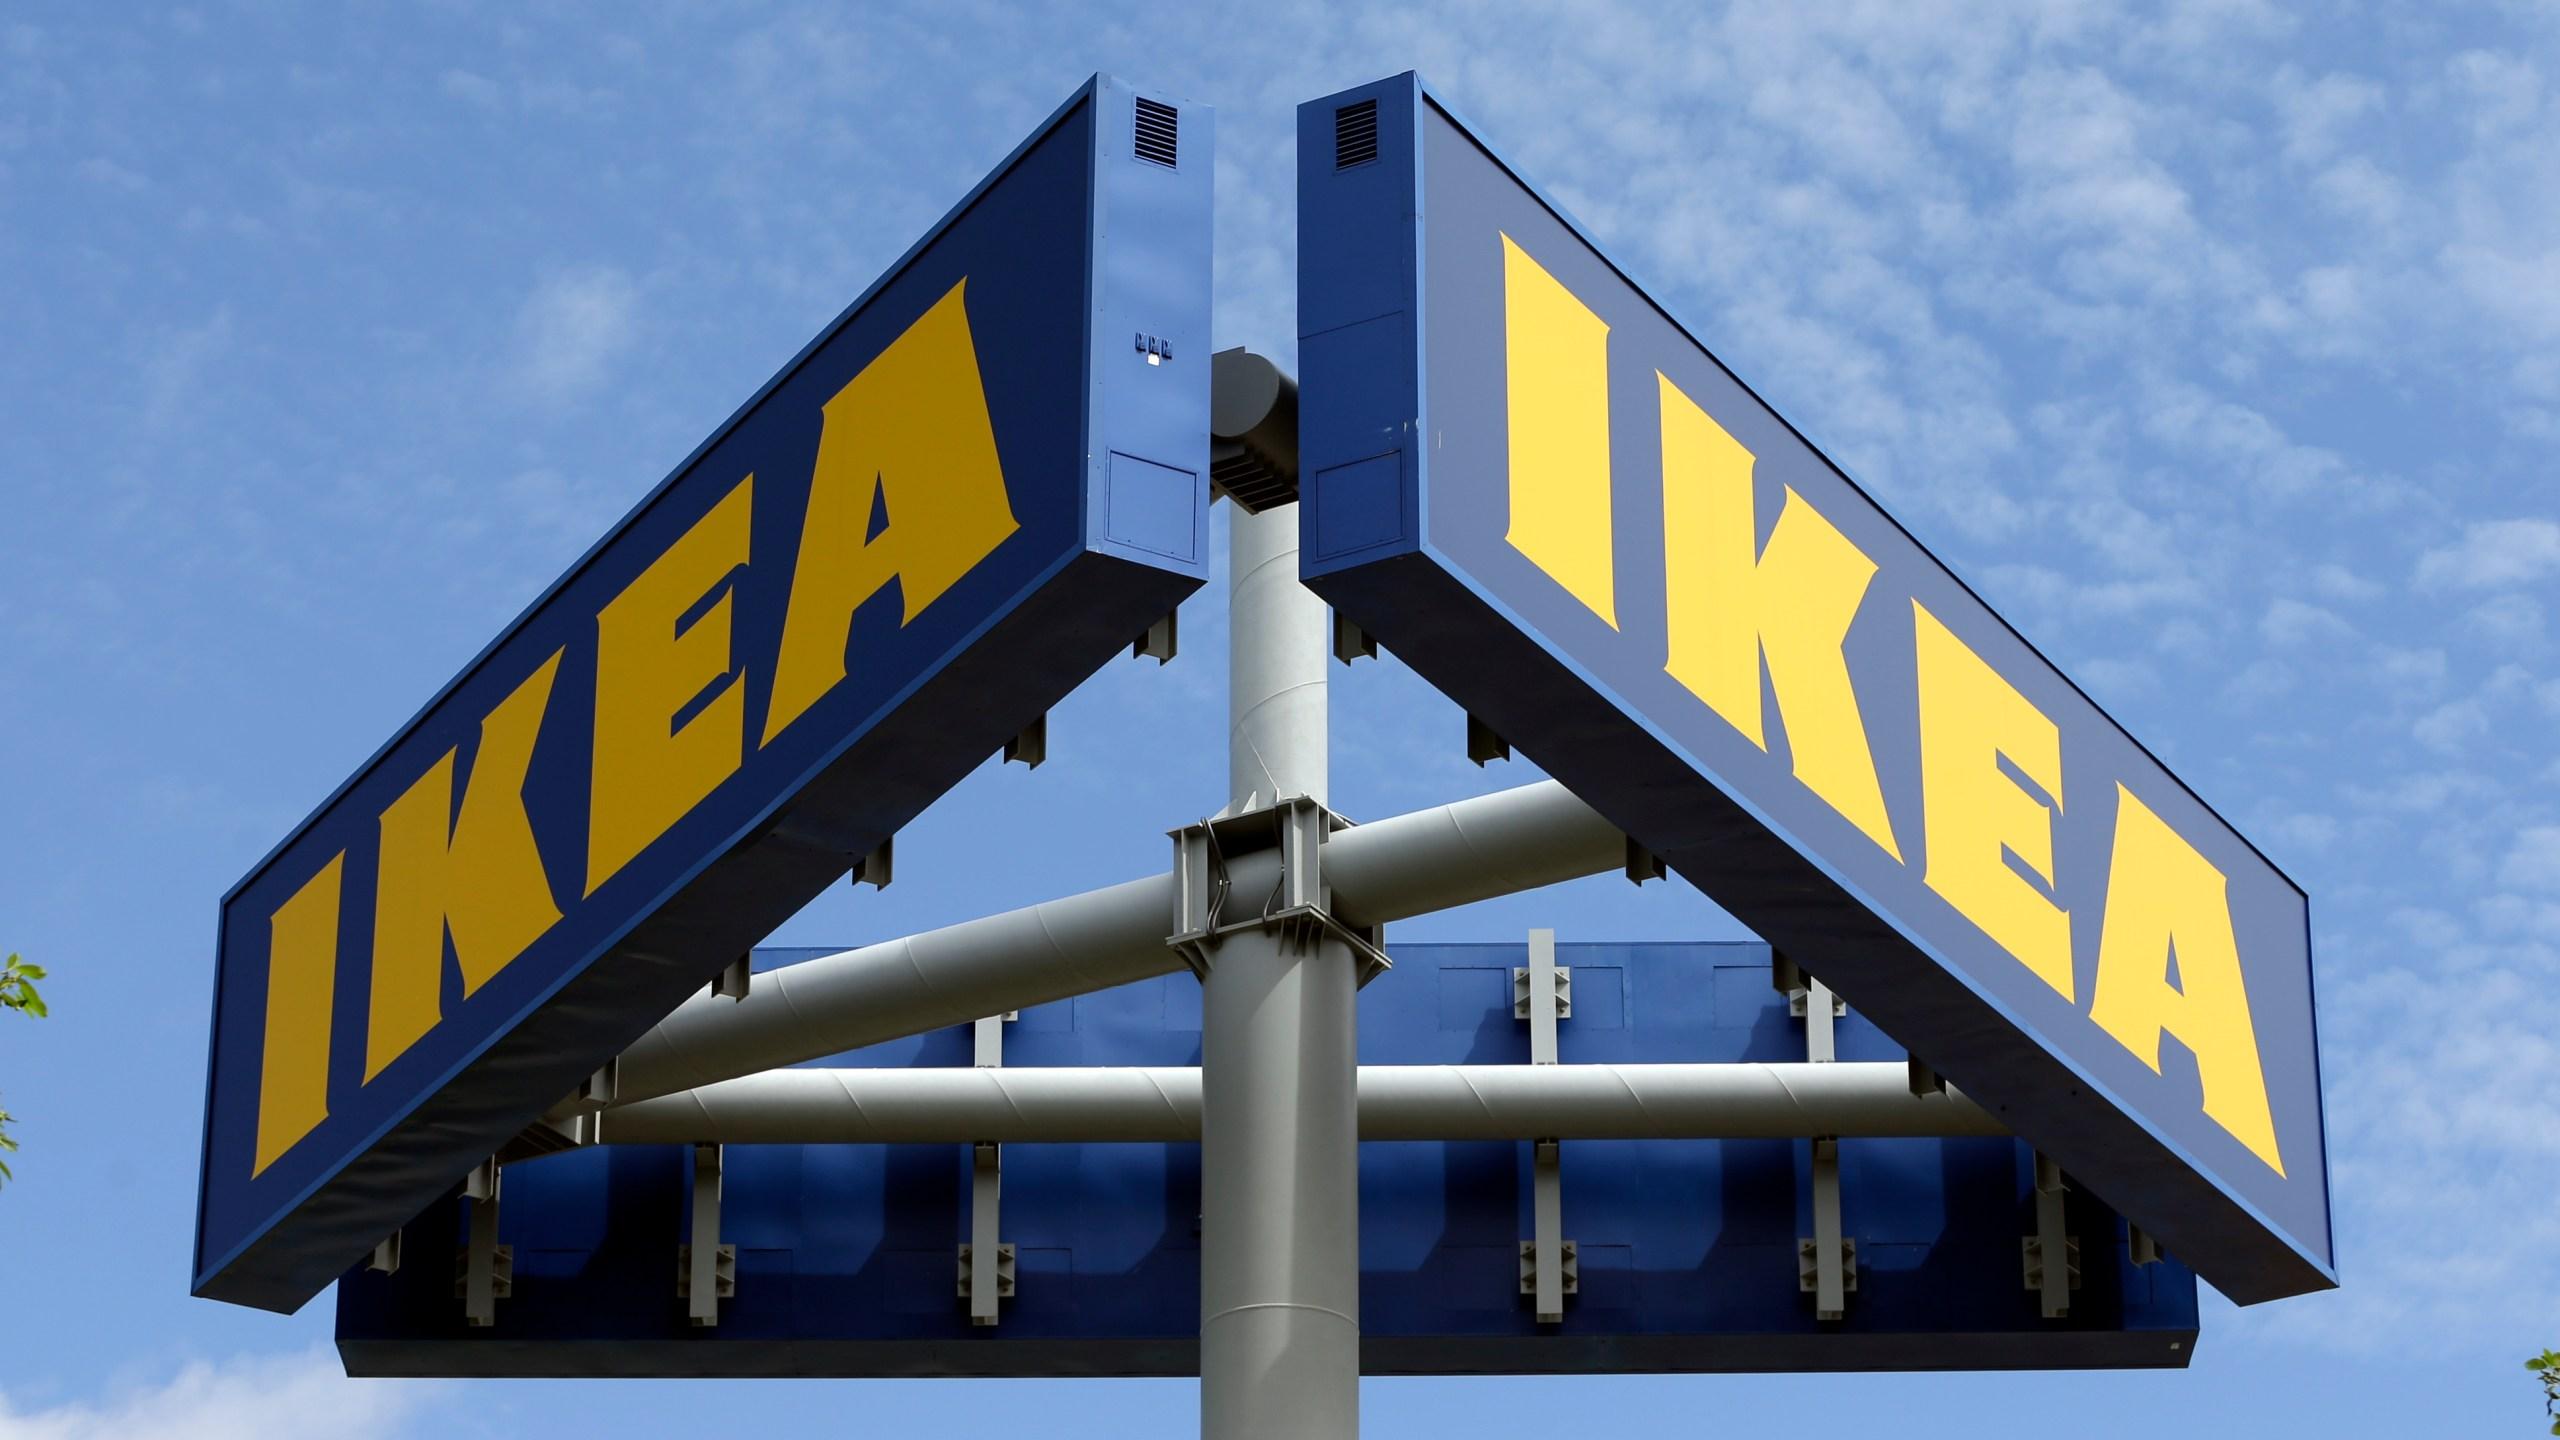 Ikea_181229